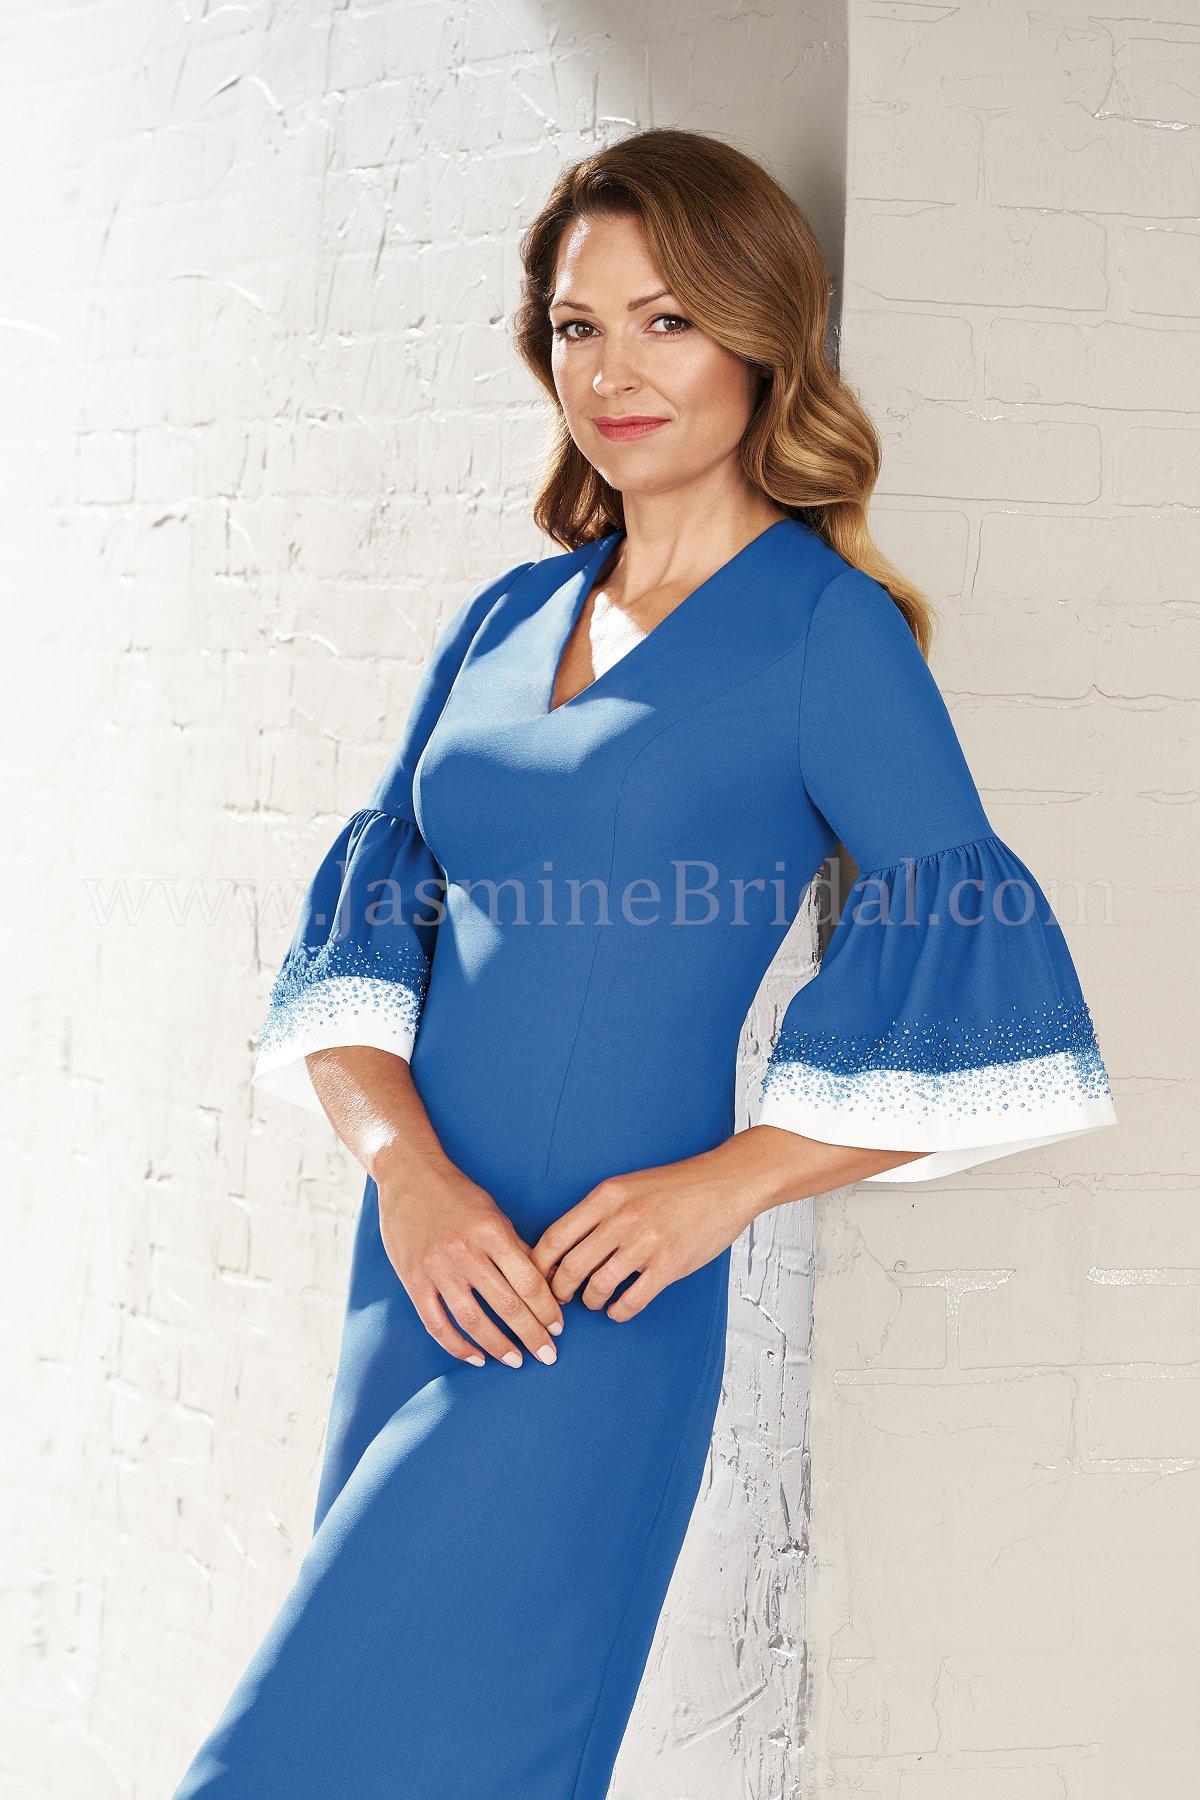 M200002 Knee Length V-neck Soft Crepe MOB Dress with Sleeves